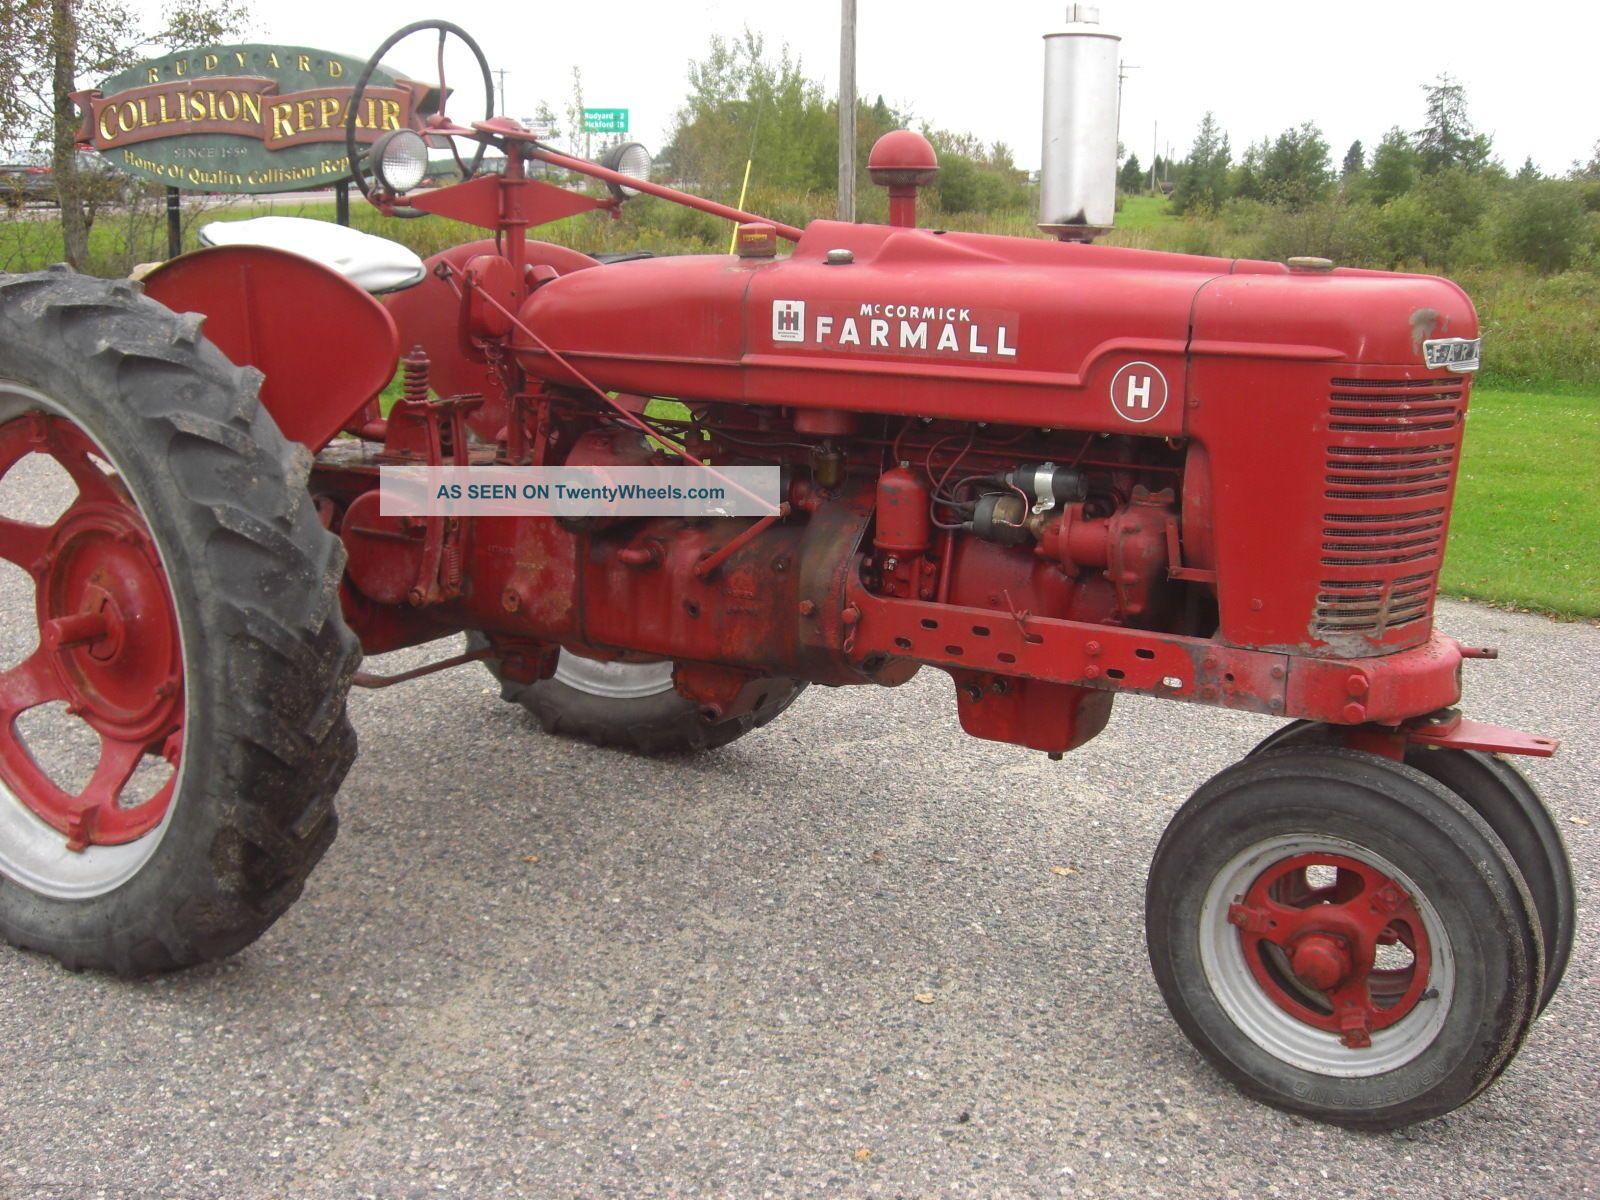 1940 International Harvester Mccormick Farmall H Wheeled Tractor